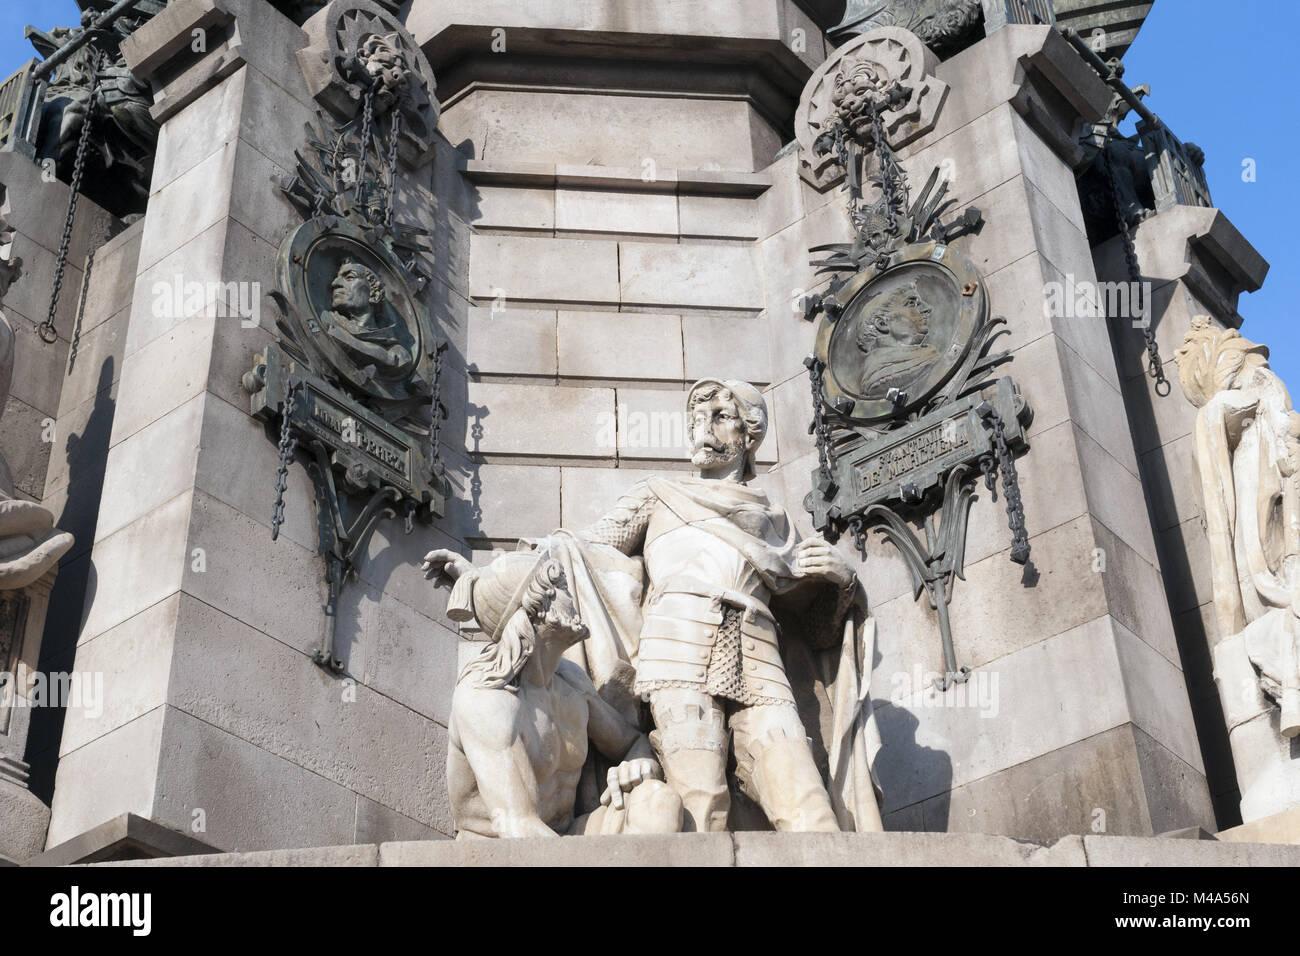 fragment of Columbus monument in Barcelona; this sculpture shows Captain Pedro Bertran i de Margarit - Stock Image